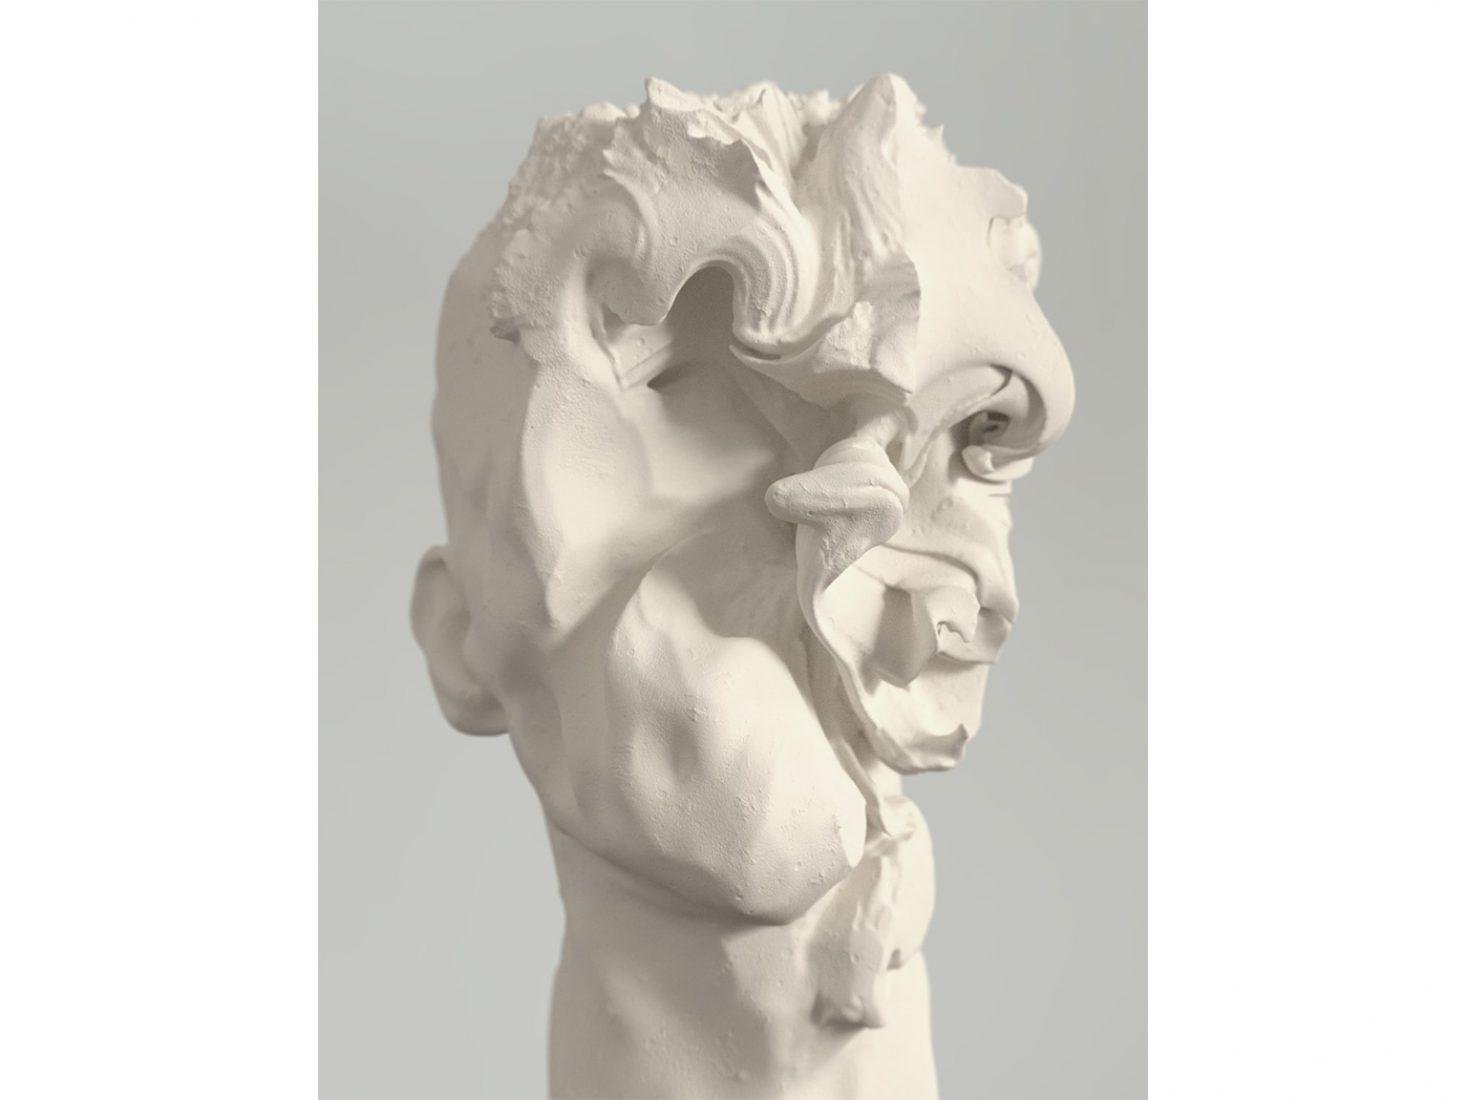 Nikolay Konstantinov. Head 23, 2016, plaster, 36 x 28 x 23 cm